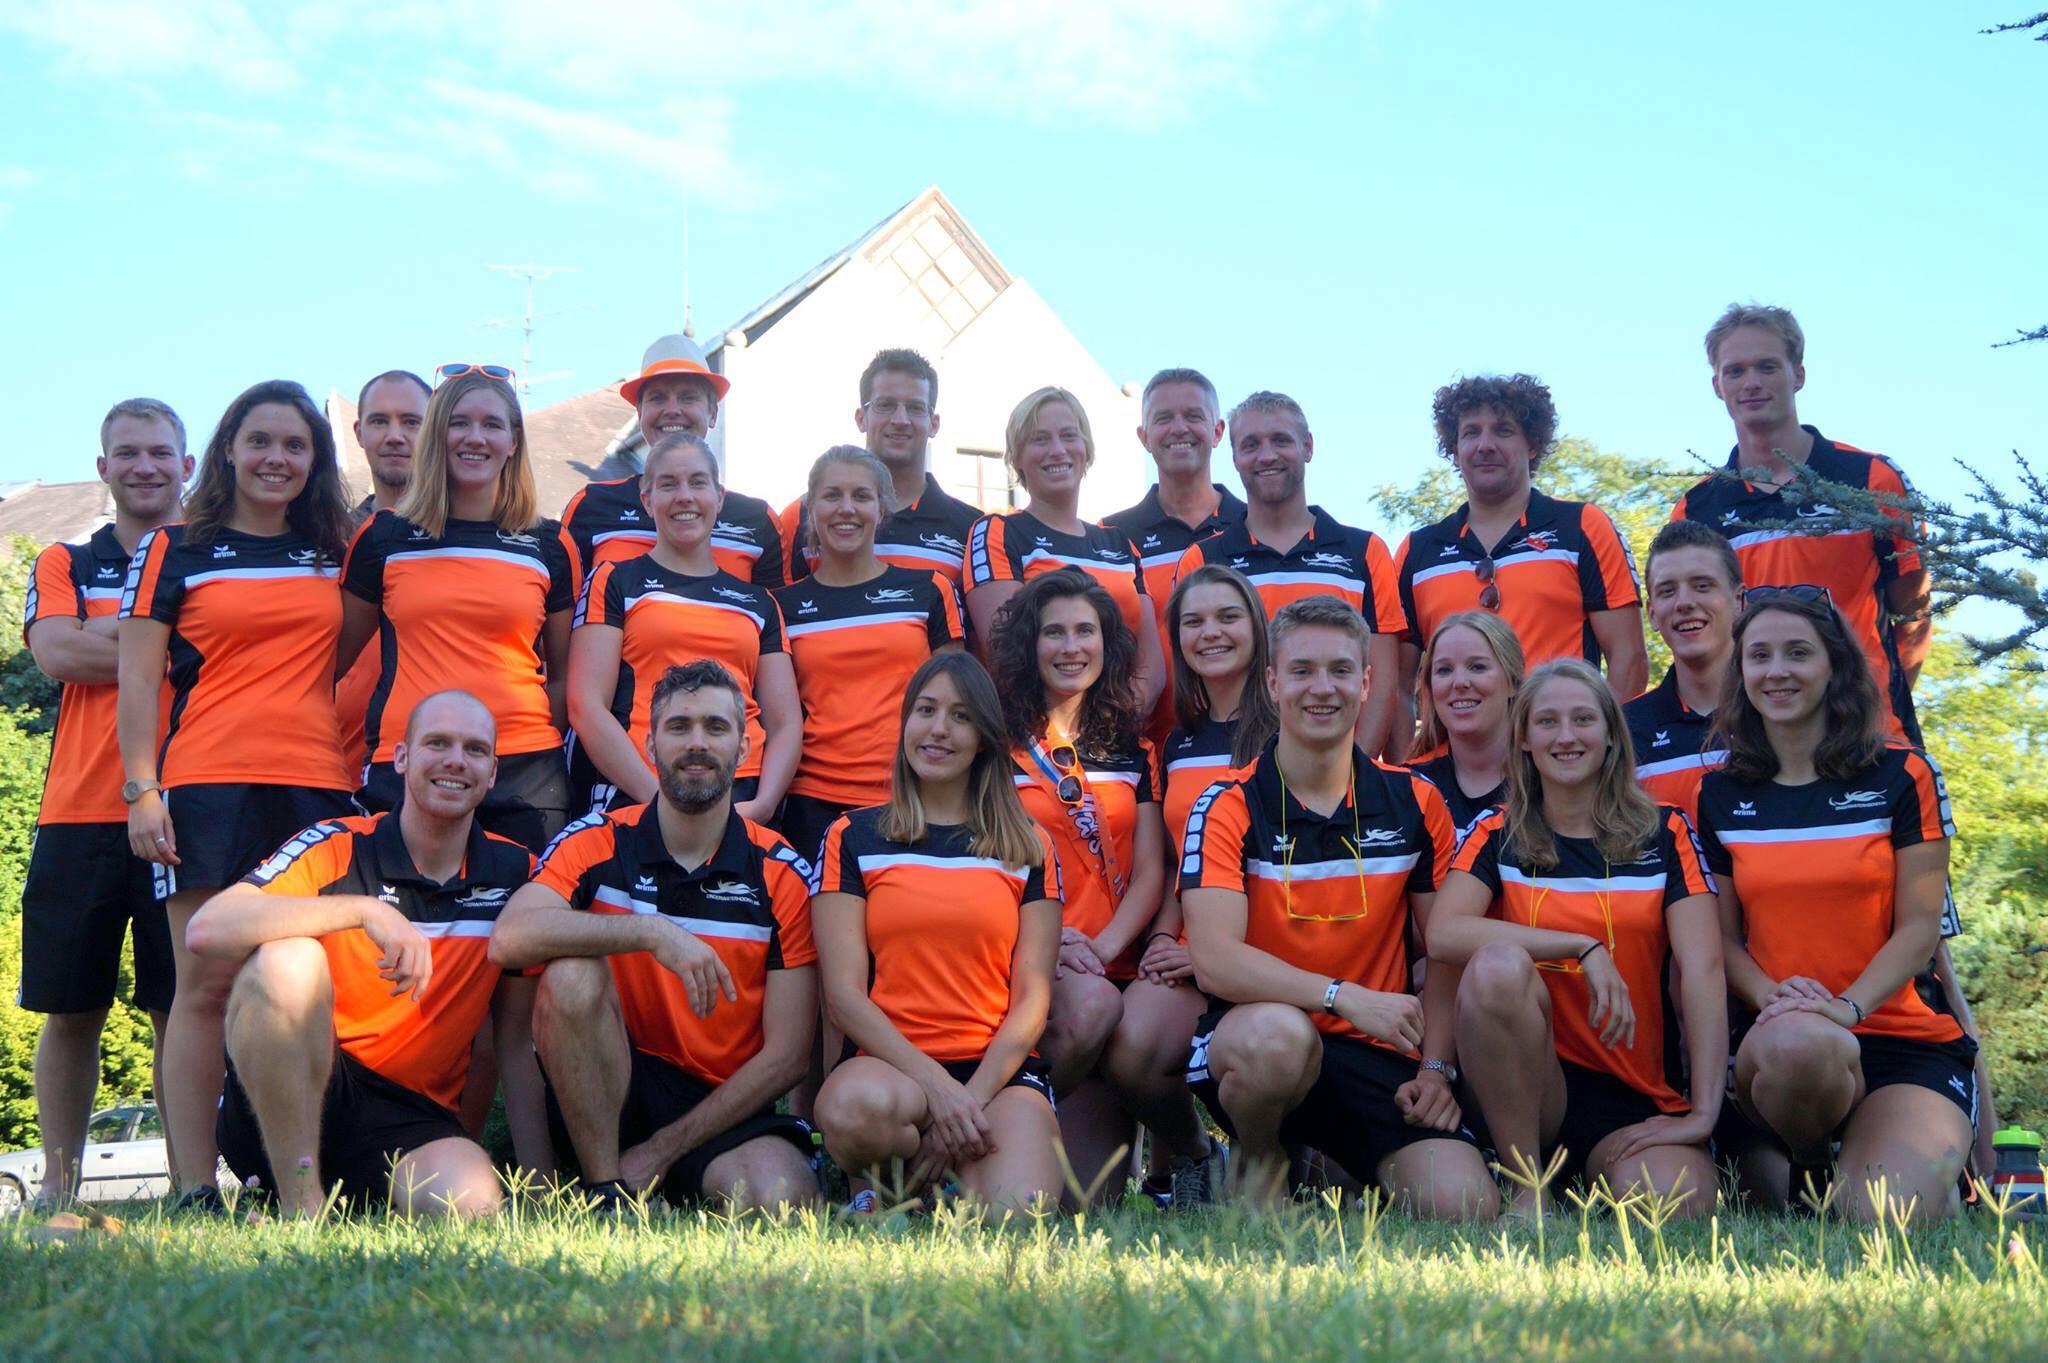 teams spaanse competitie